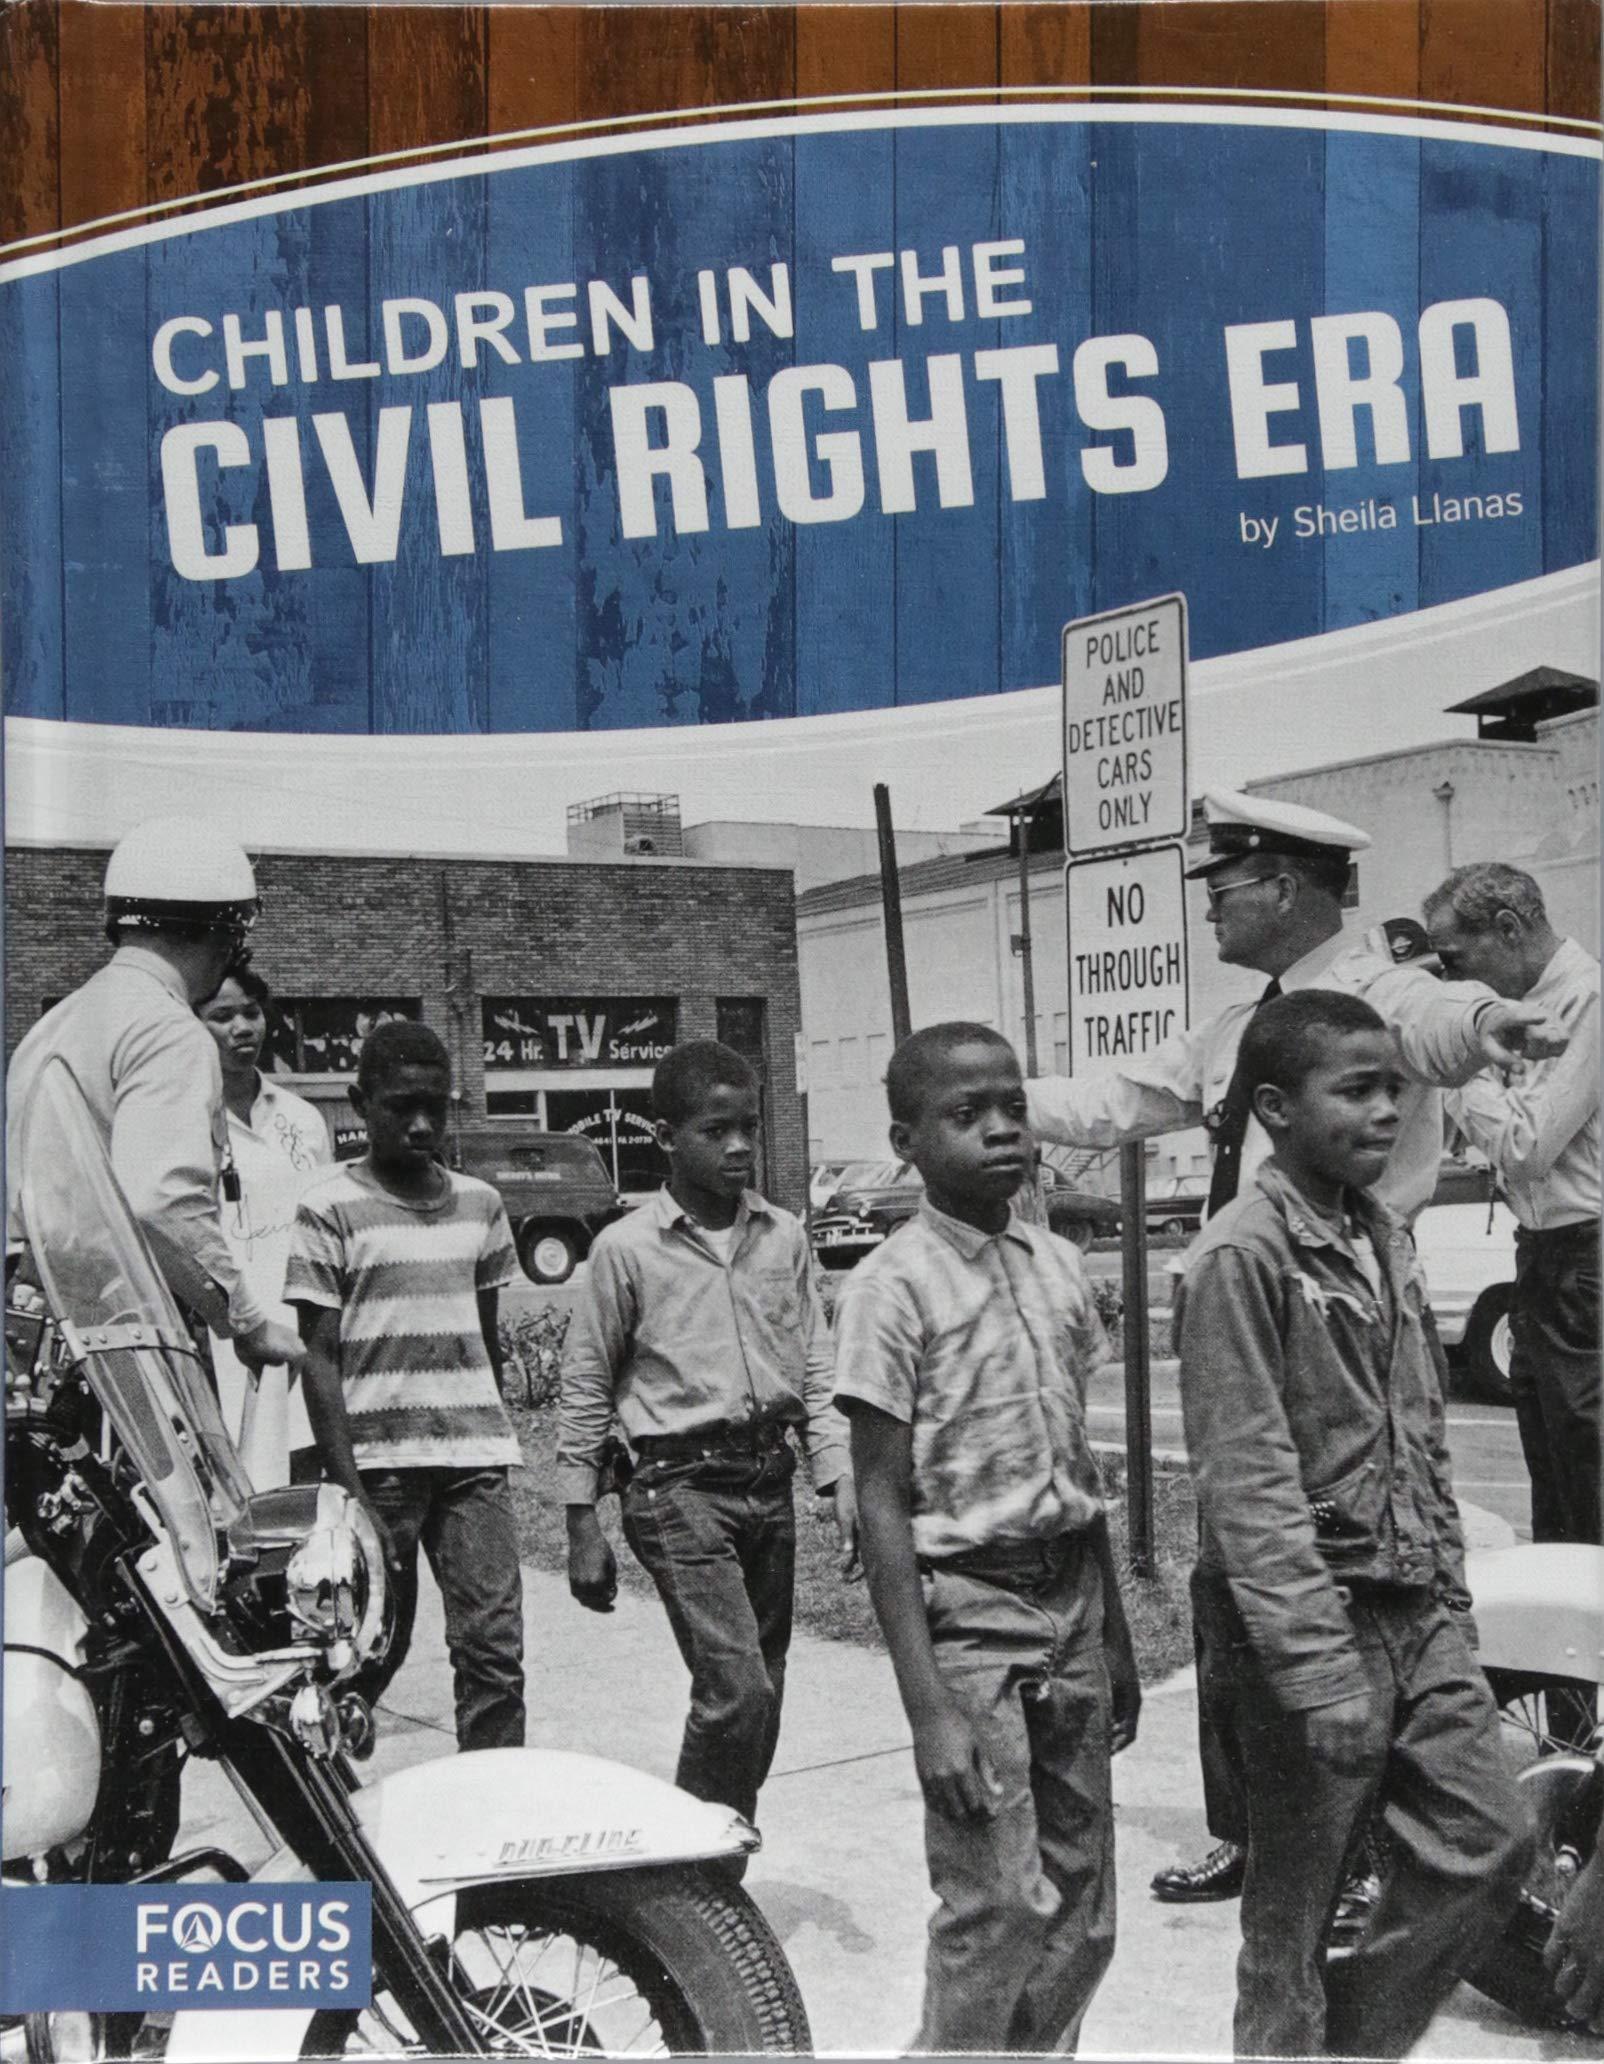 The Civil Rights Of Children >> Children In The Civil Rights Era Focus Readers Children In